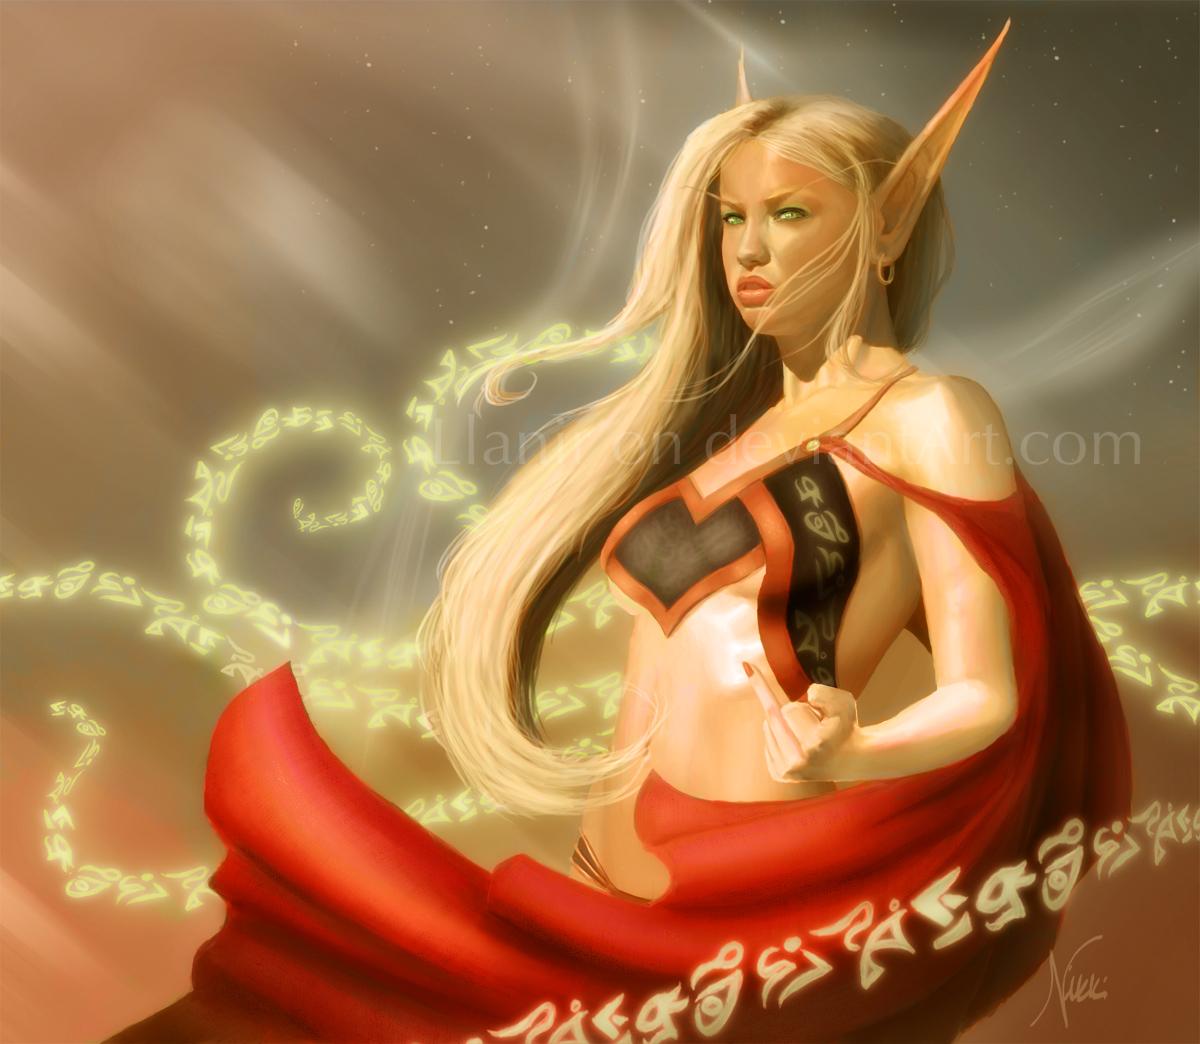 Jizzart blood elf sucks dragons cock nude streaming